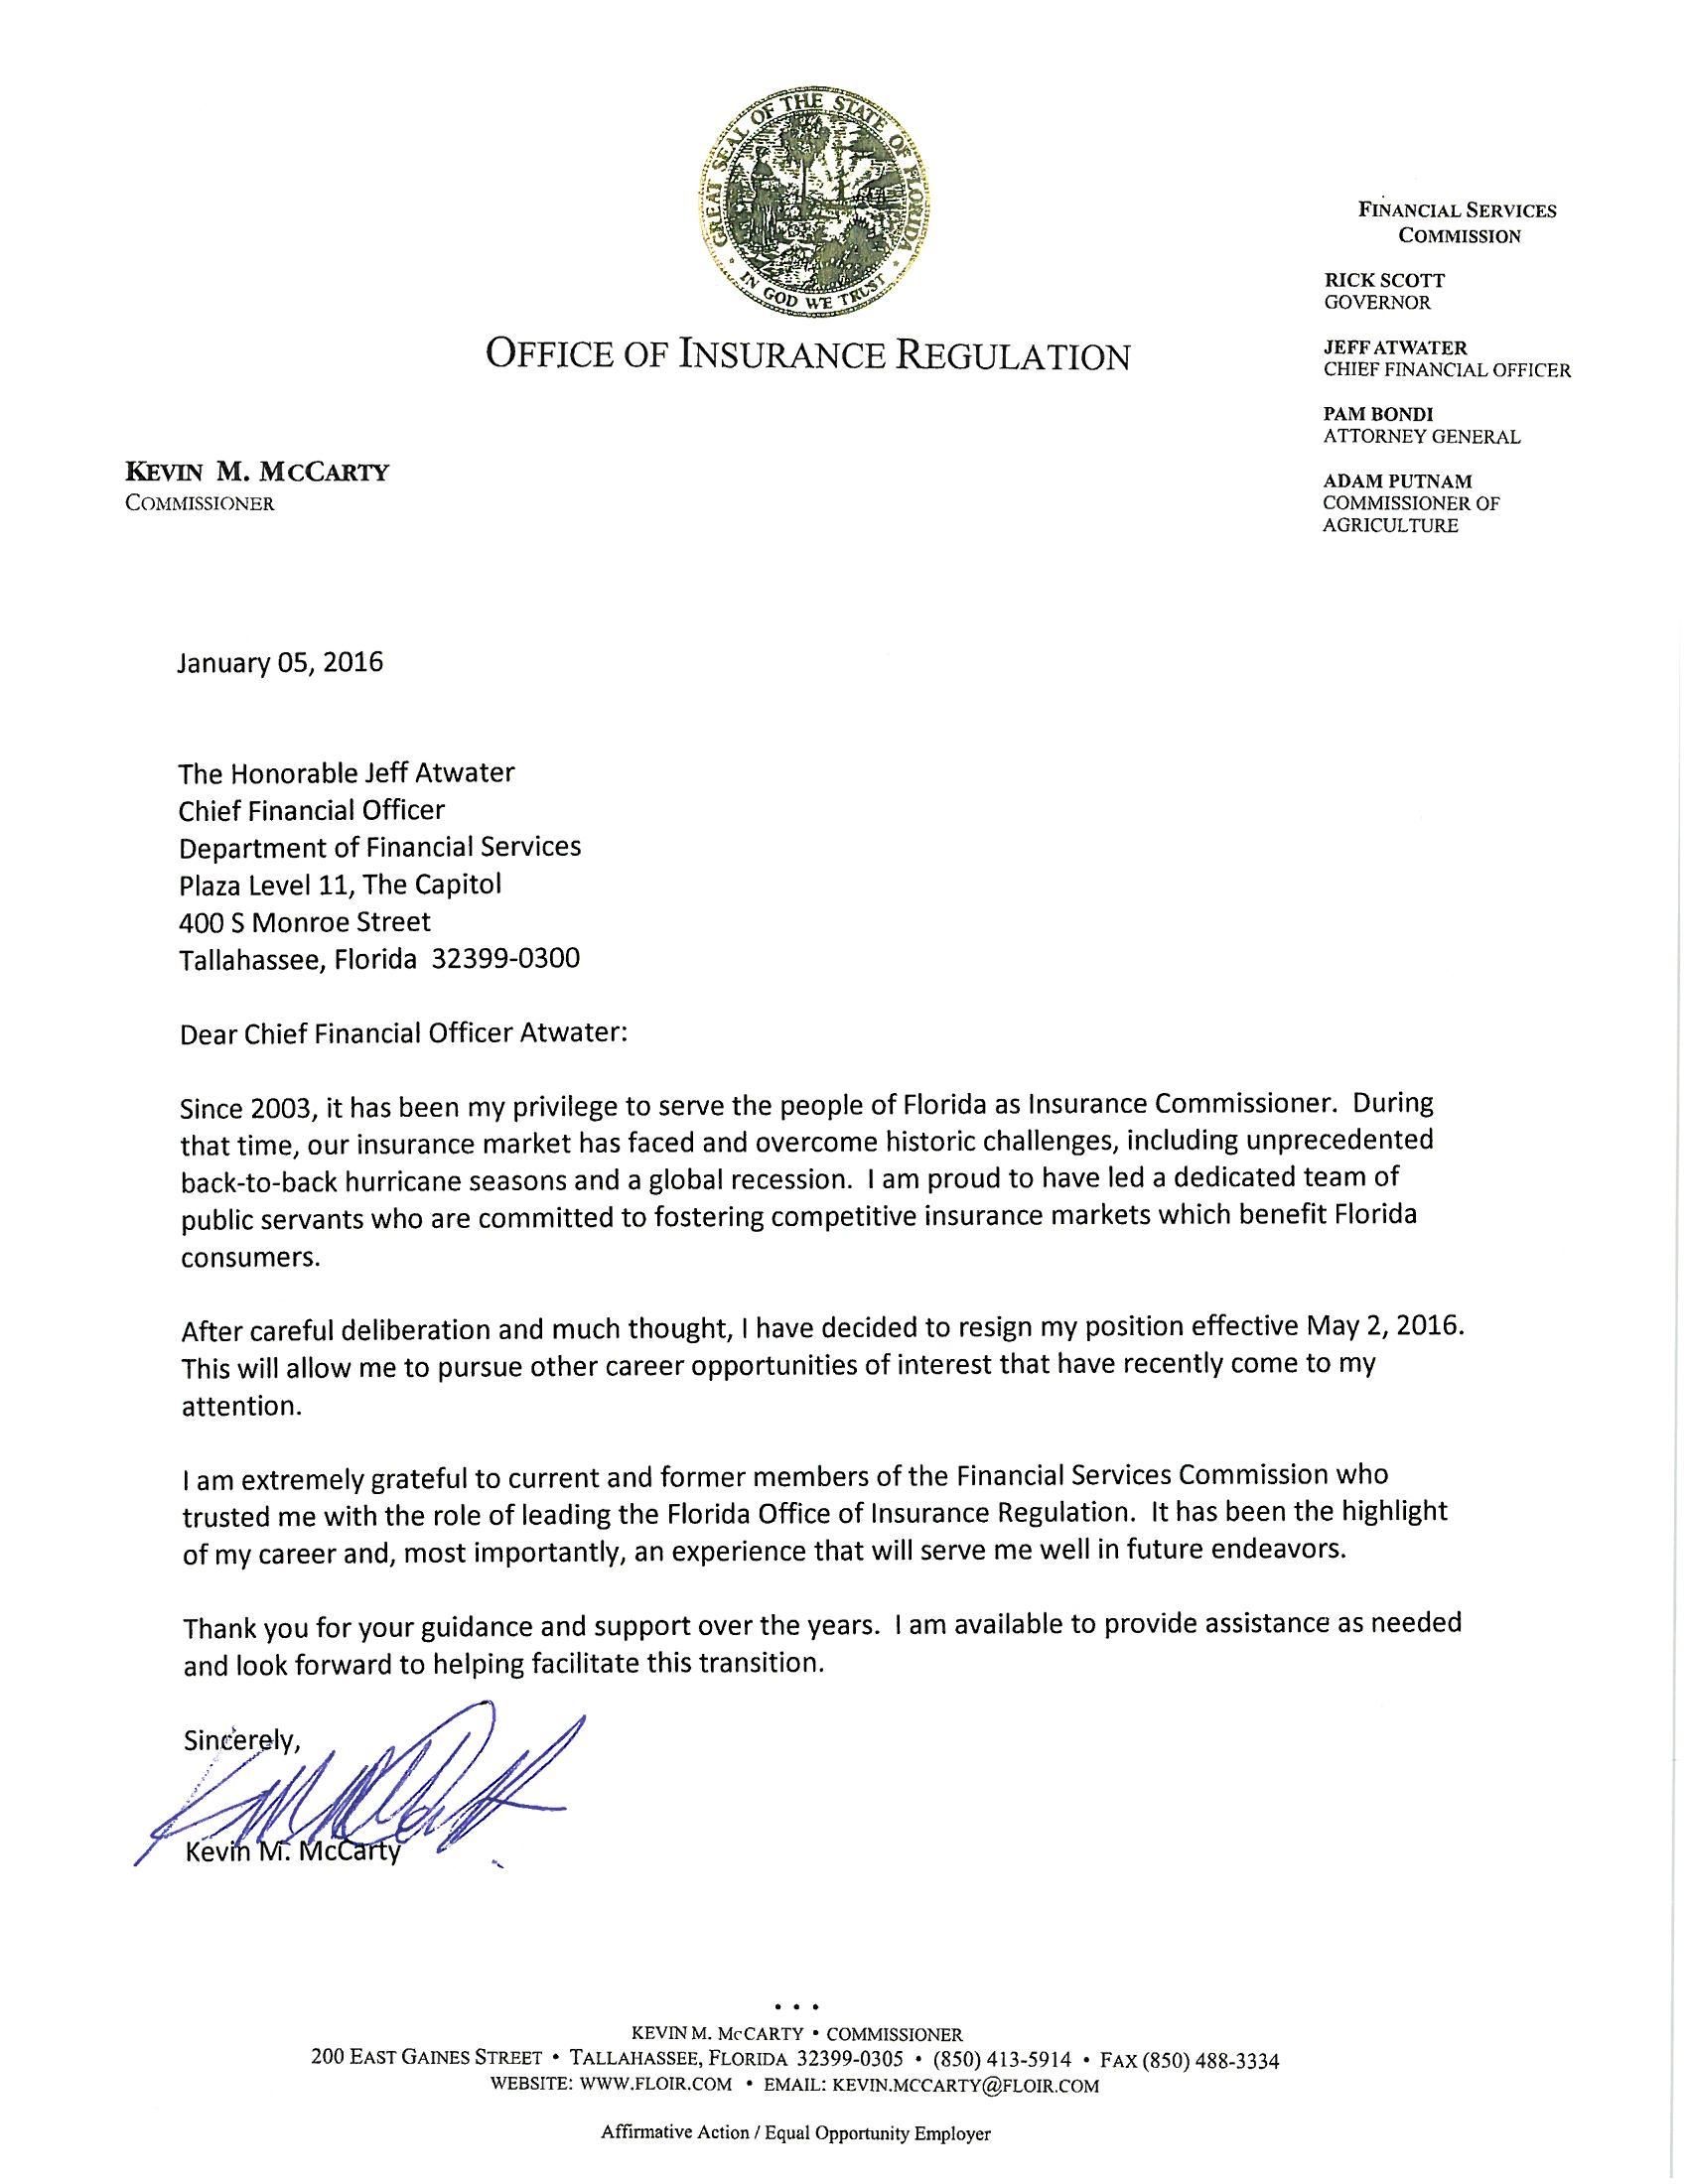 McCarty resignation letter